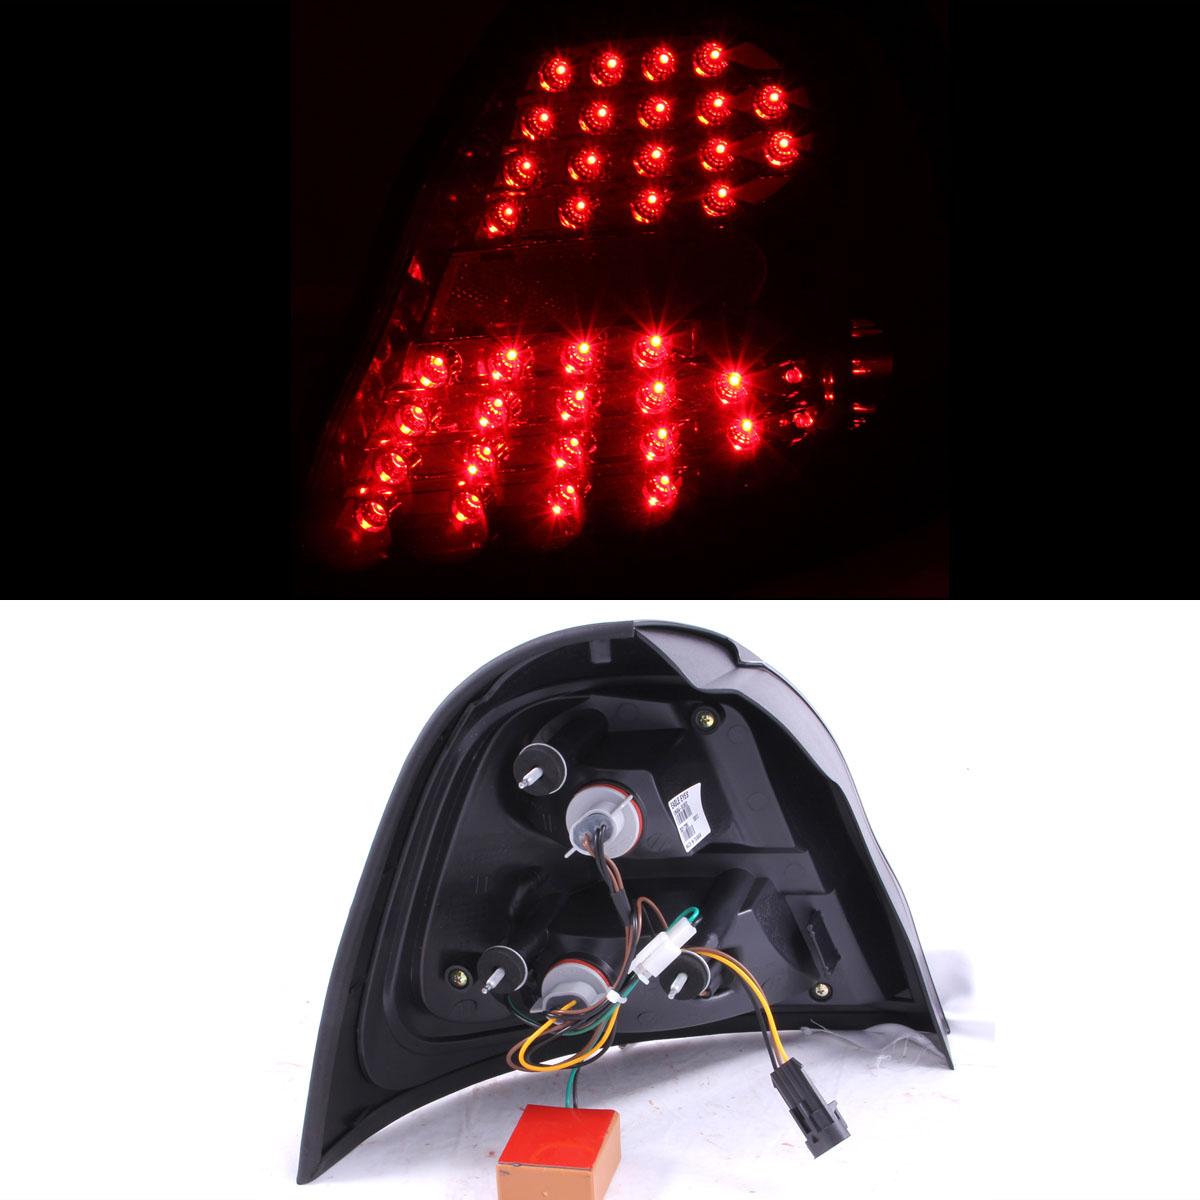 2004 2005 2006 2007 2008 pontiac grand prix smoke led rear brake tail lights ebay. Black Bedroom Furniture Sets. Home Design Ideas